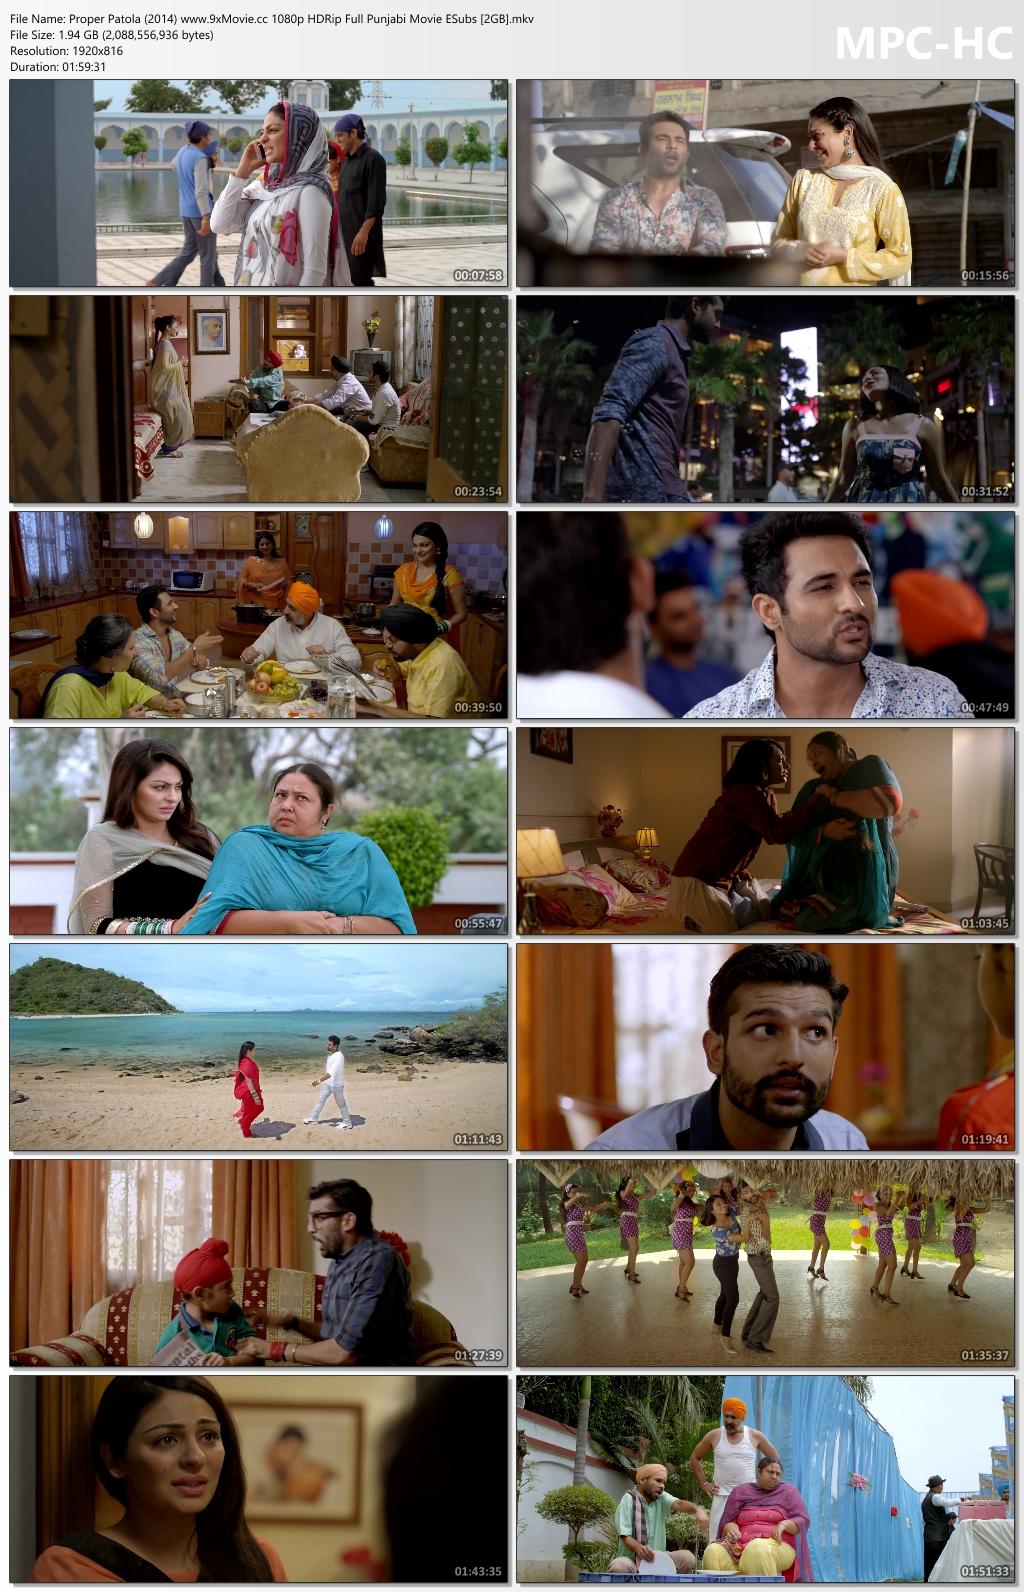 Proper-Patola-2014-www-9x-Movie-cc-1080p-HDRip-Full-Punjabi-Movie-ESubs-2-GB-mkv